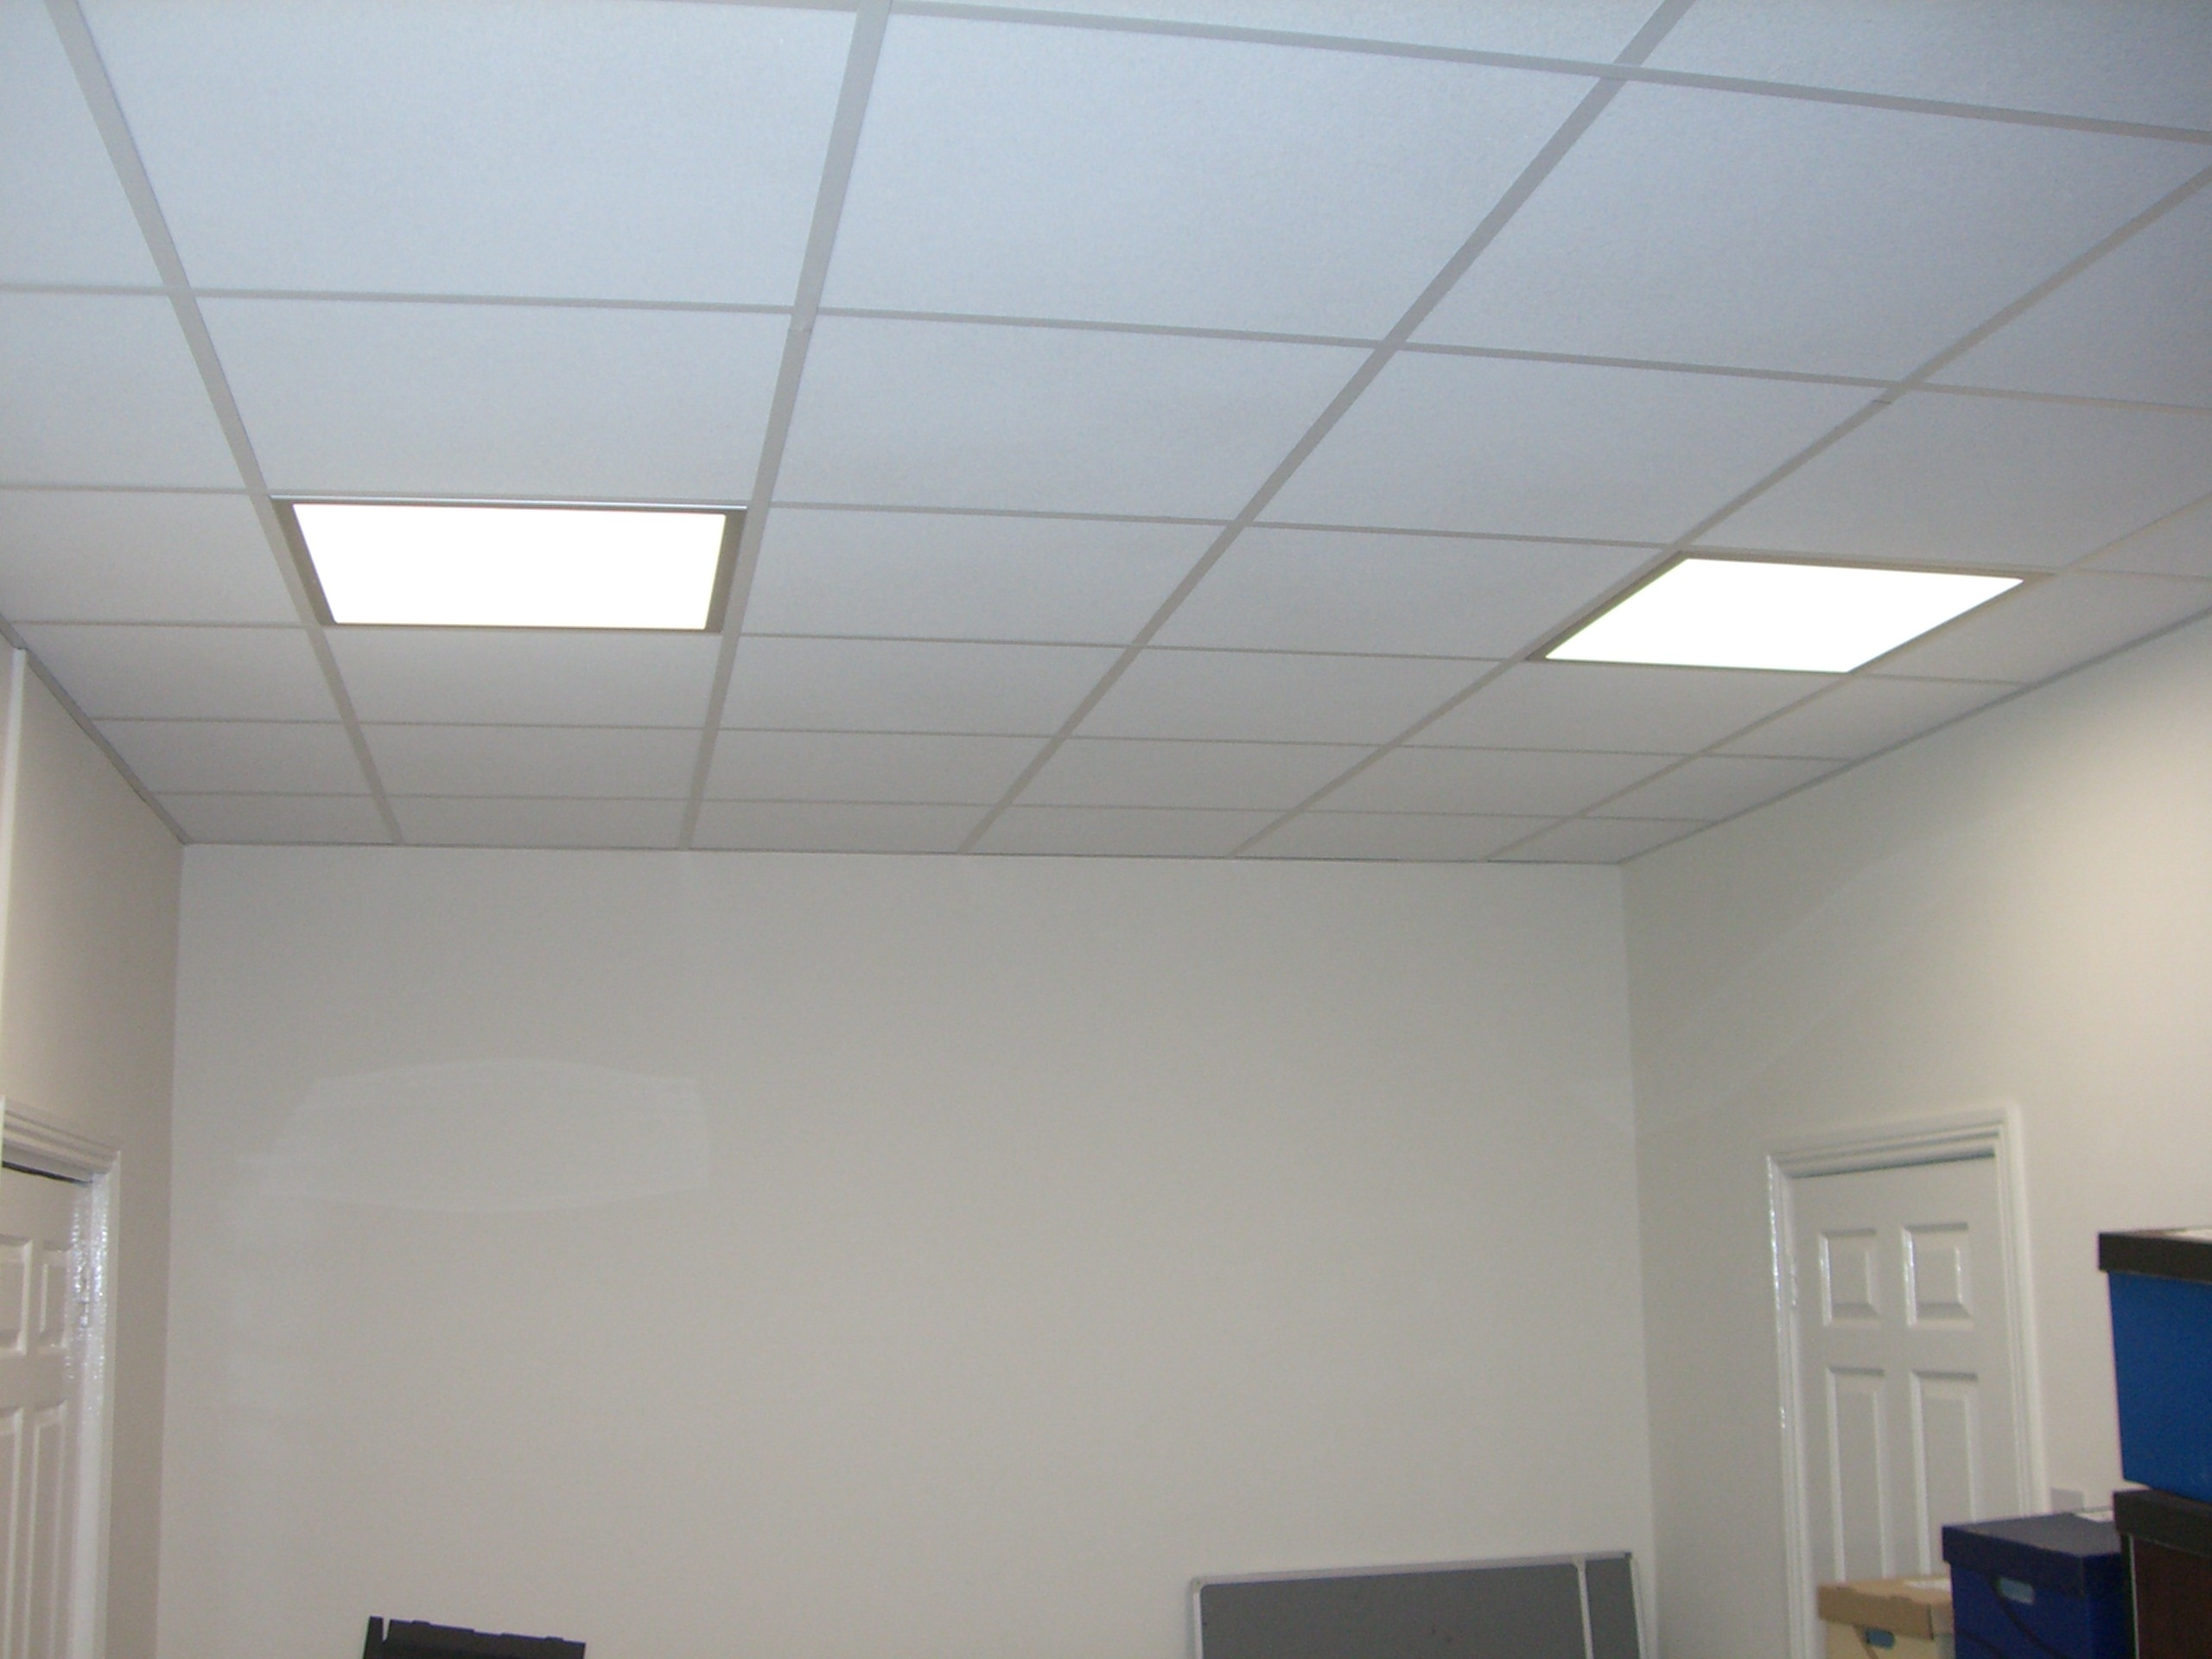 Fiberglass Drop Ceiling Tiles 2×2